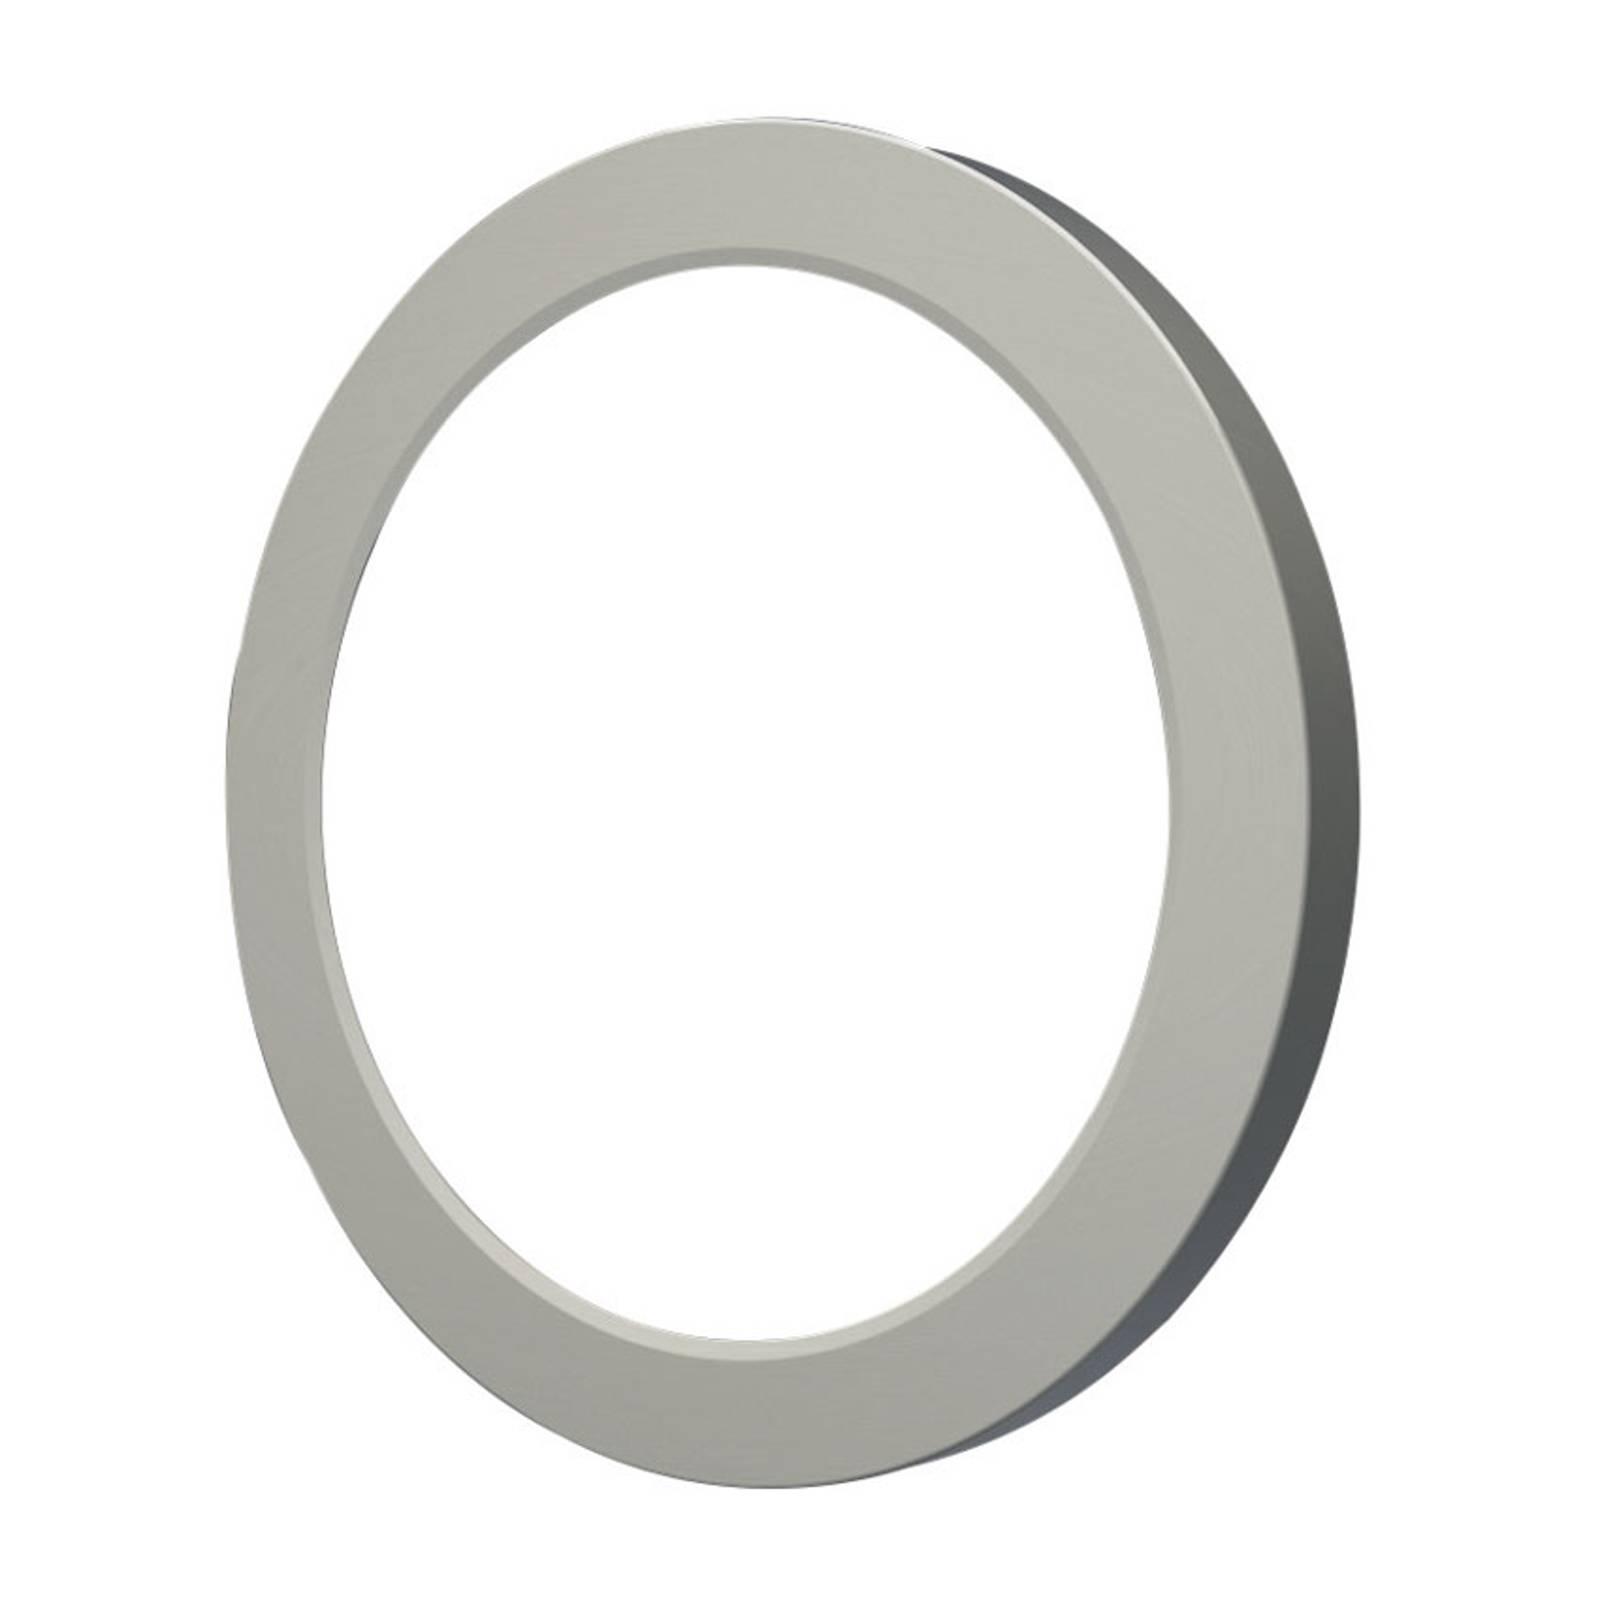 Megatron Pano magnetic cover round Ø 16.5 cm